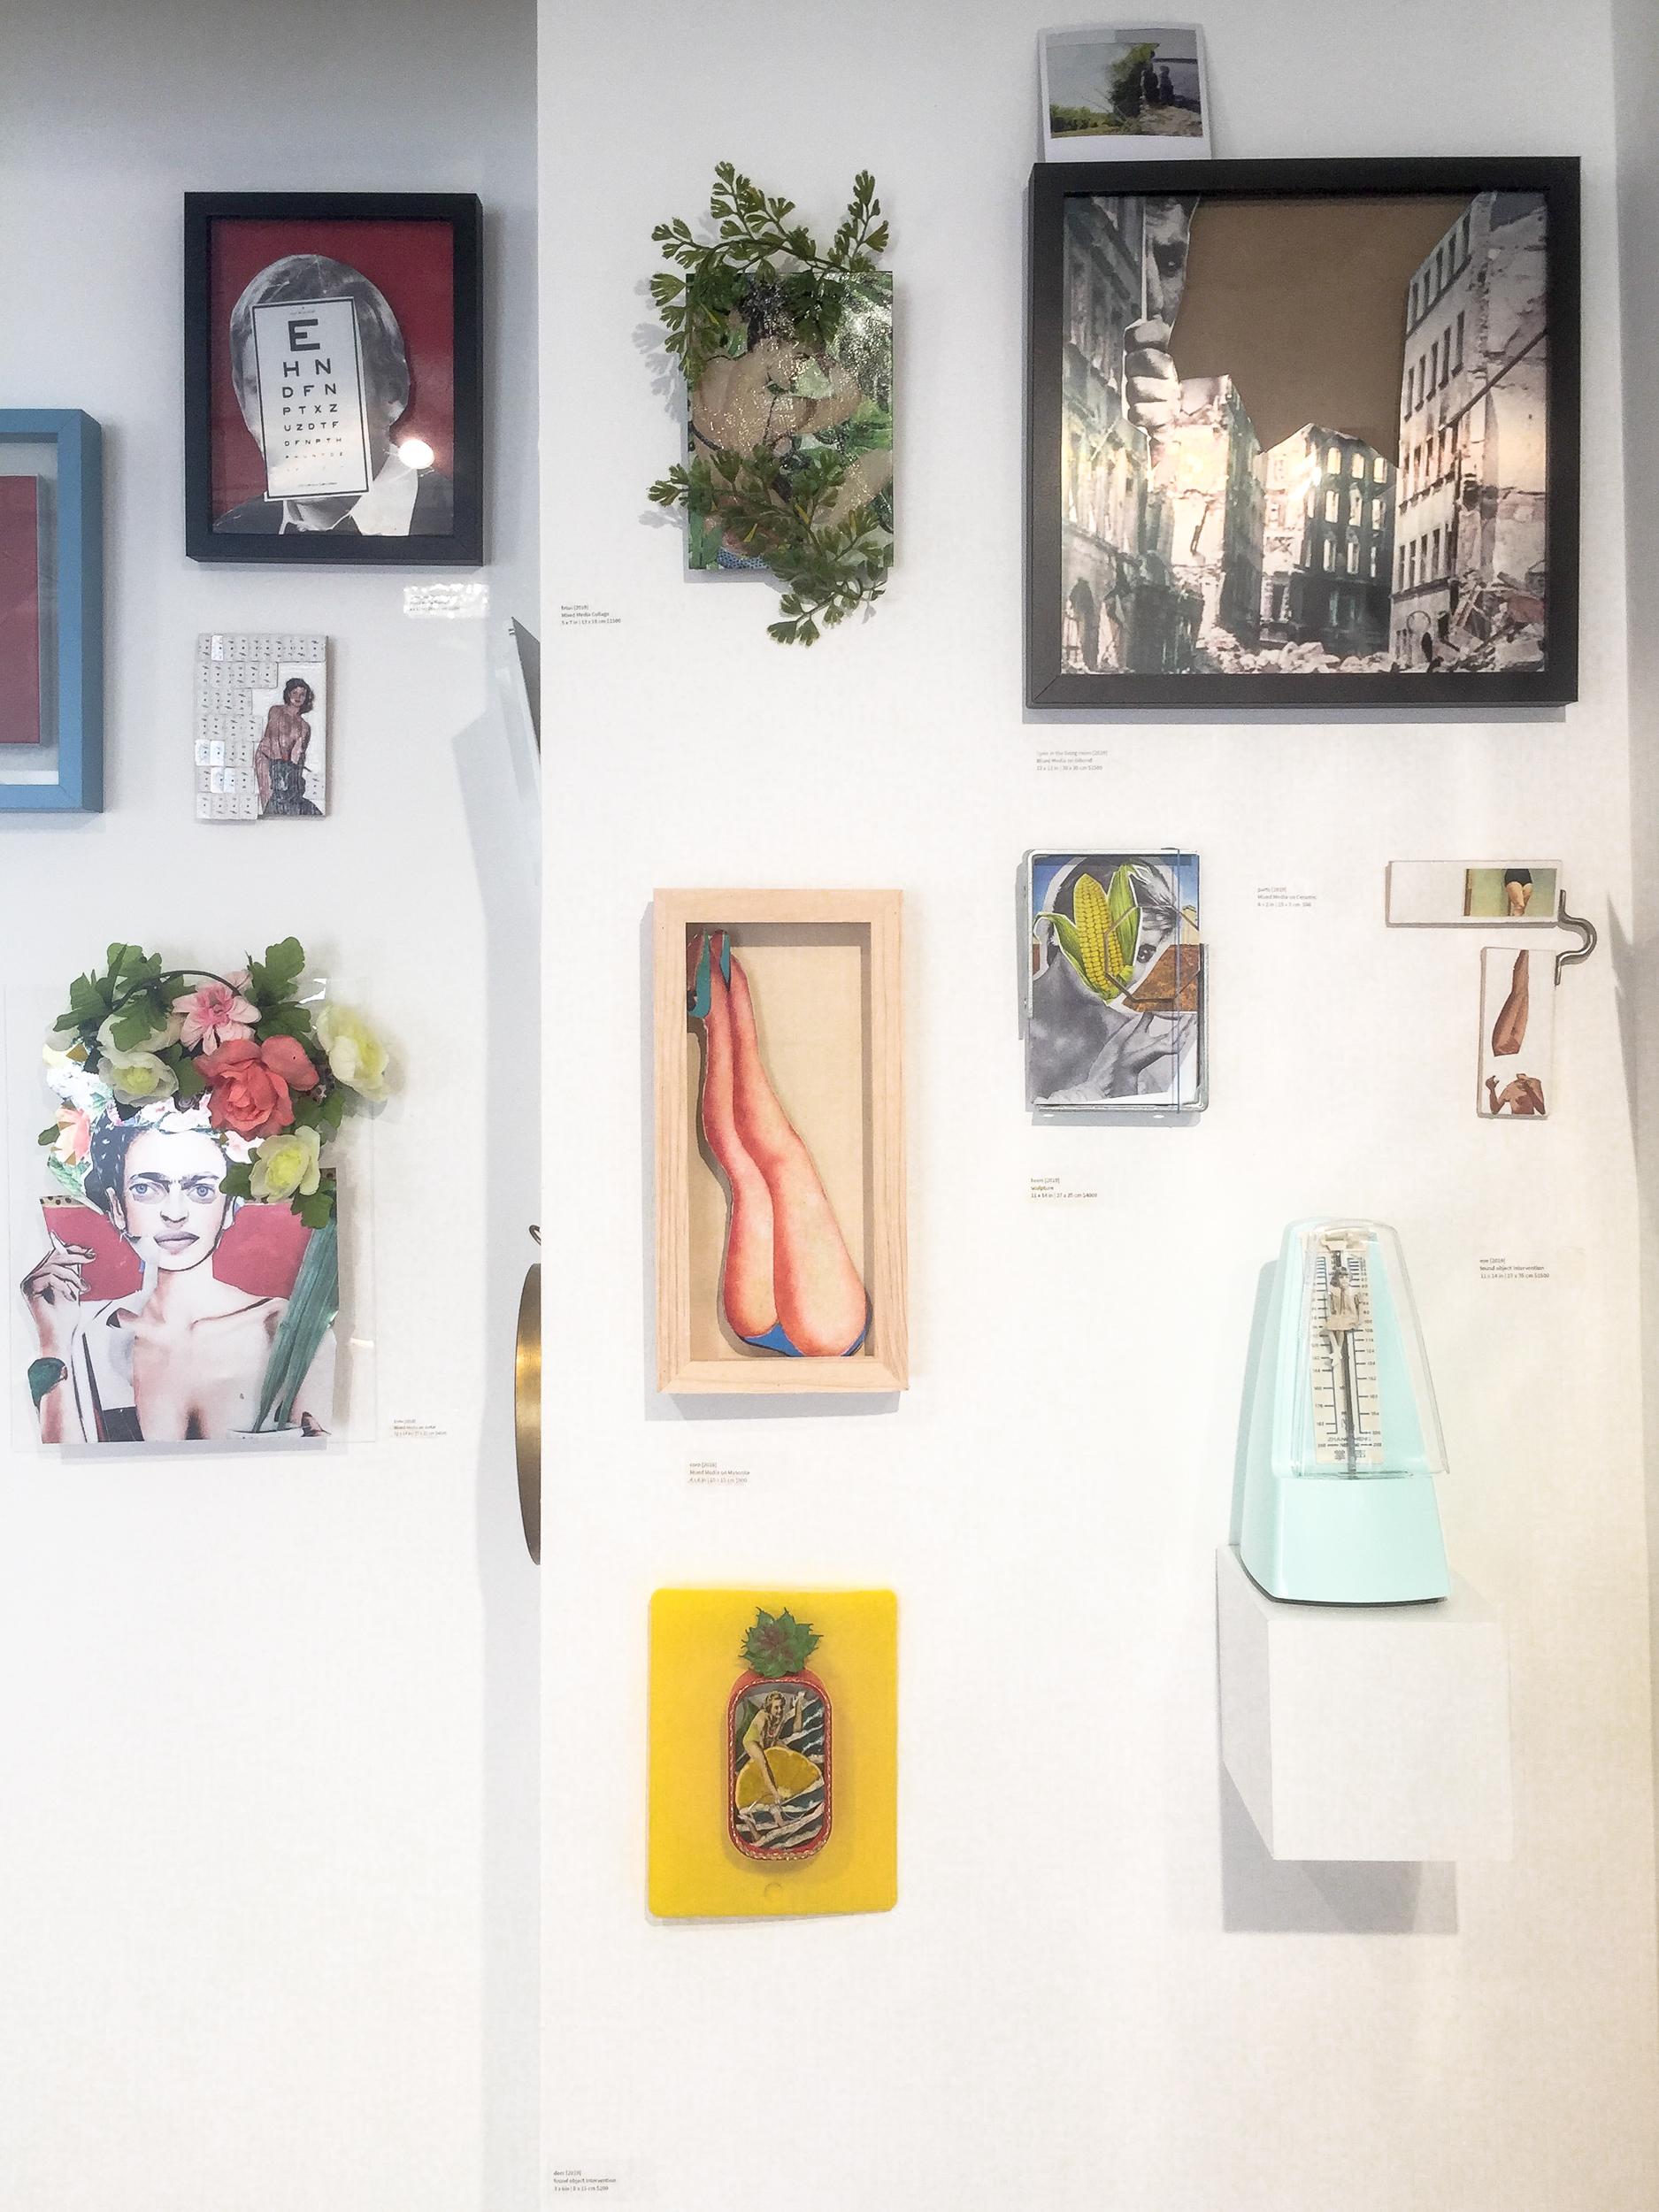 Faena-Exhibition-Images-46.jpg